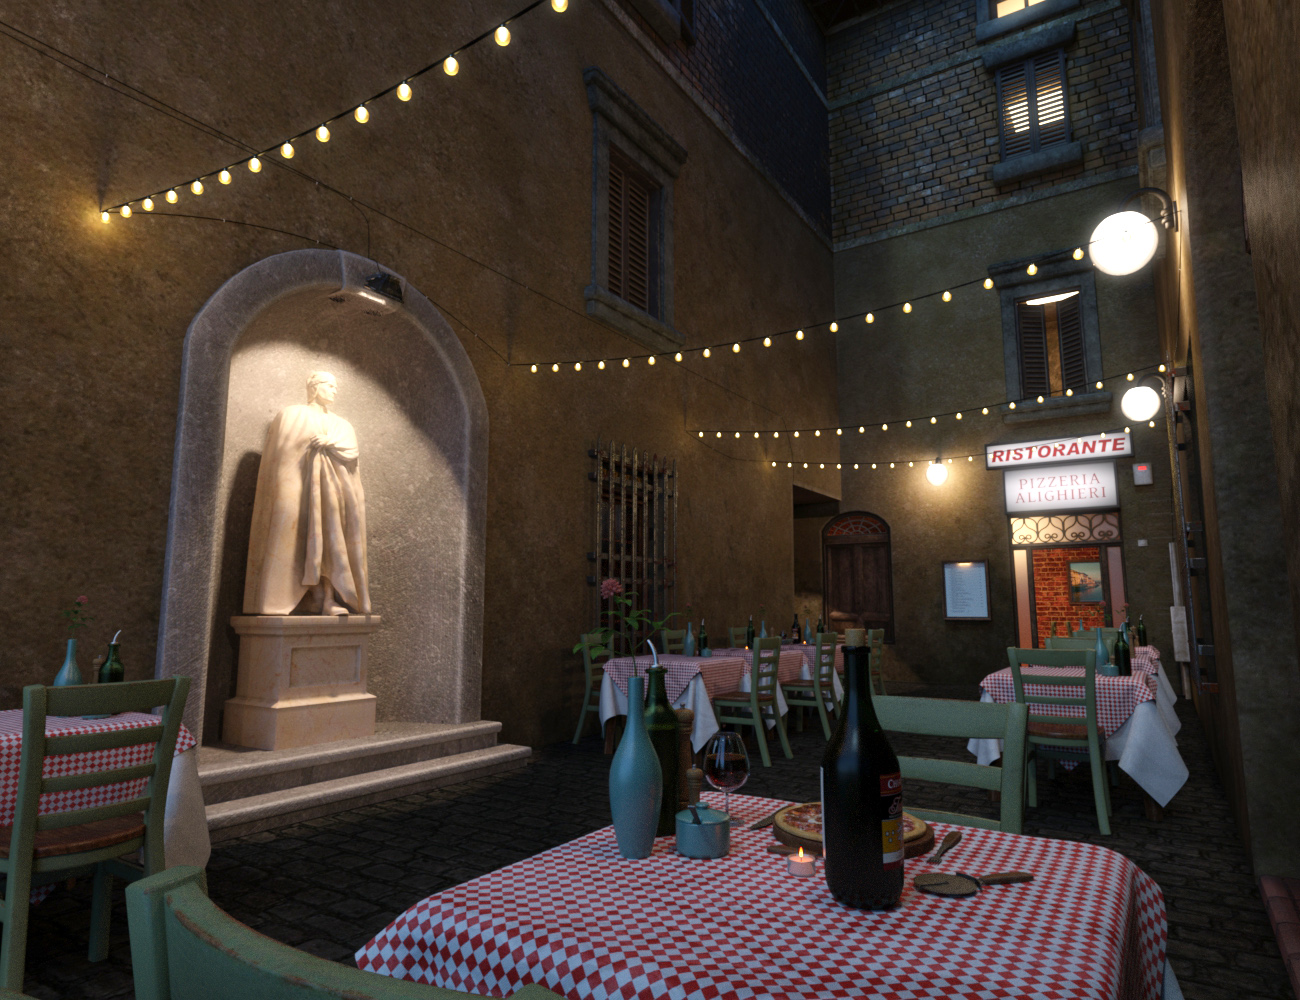 Pizzeria - Predatron 3D Models